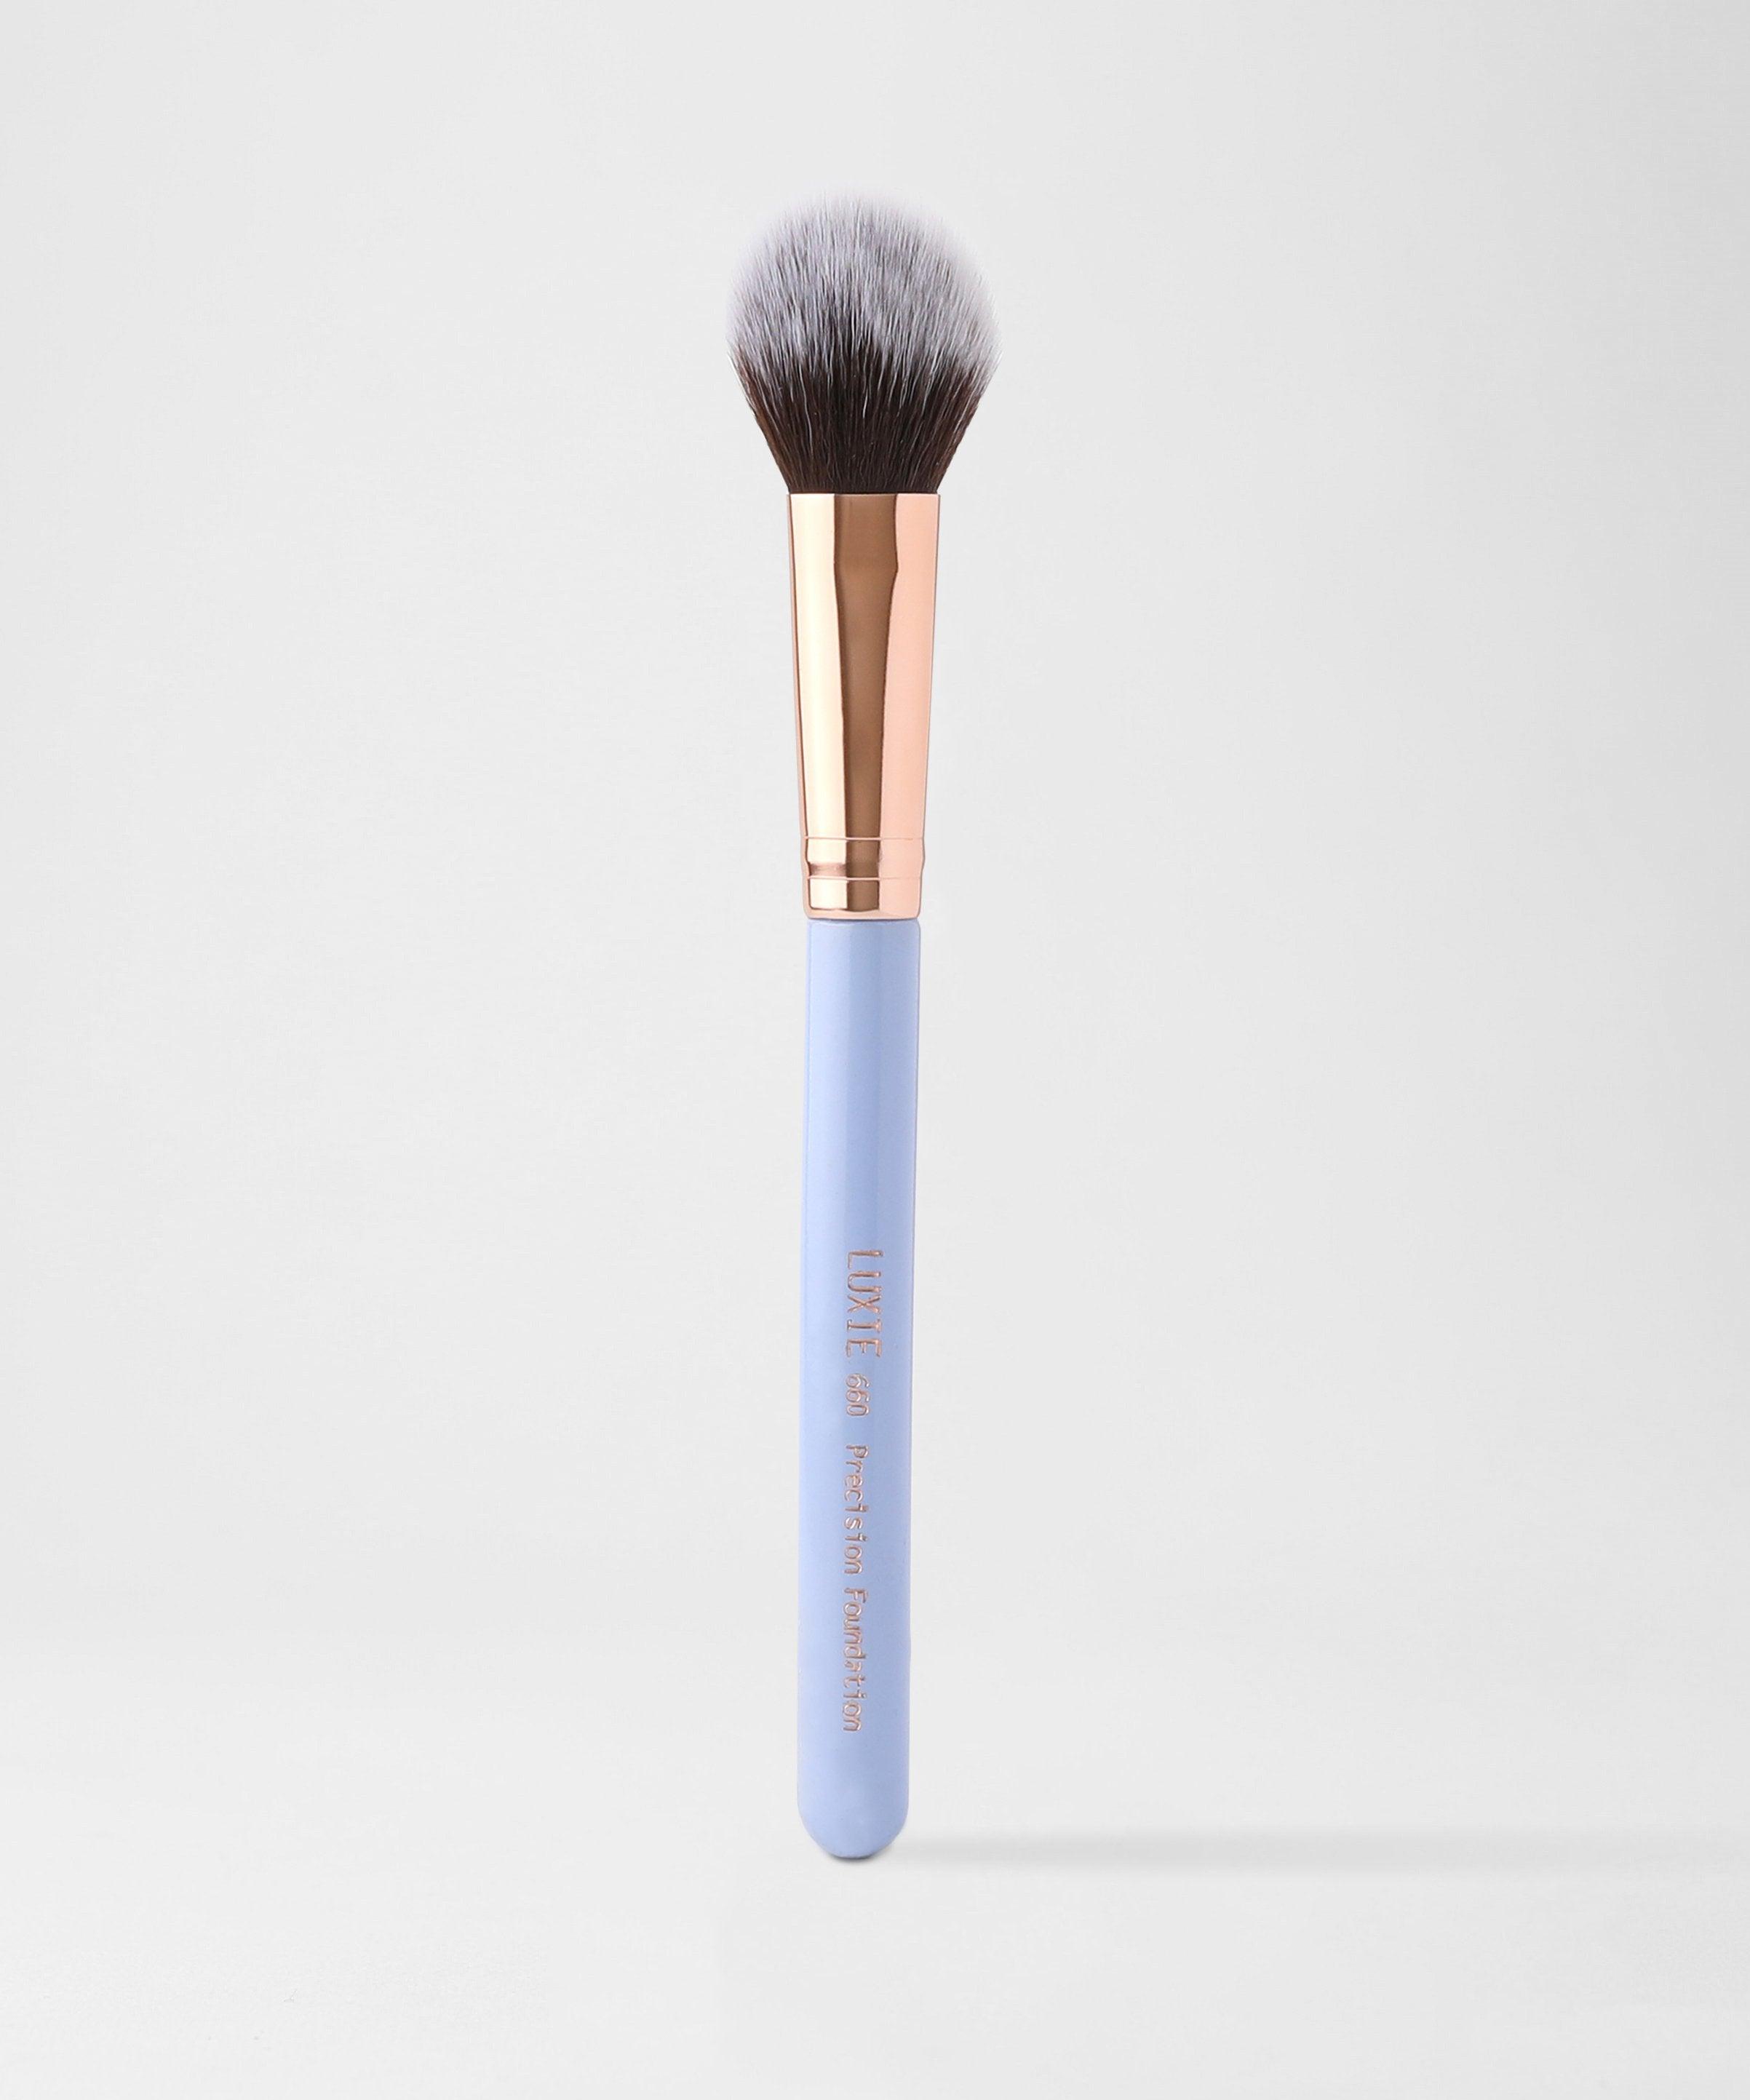 Luxie Beauty - 660 Precision Foundation Dreamcatcher